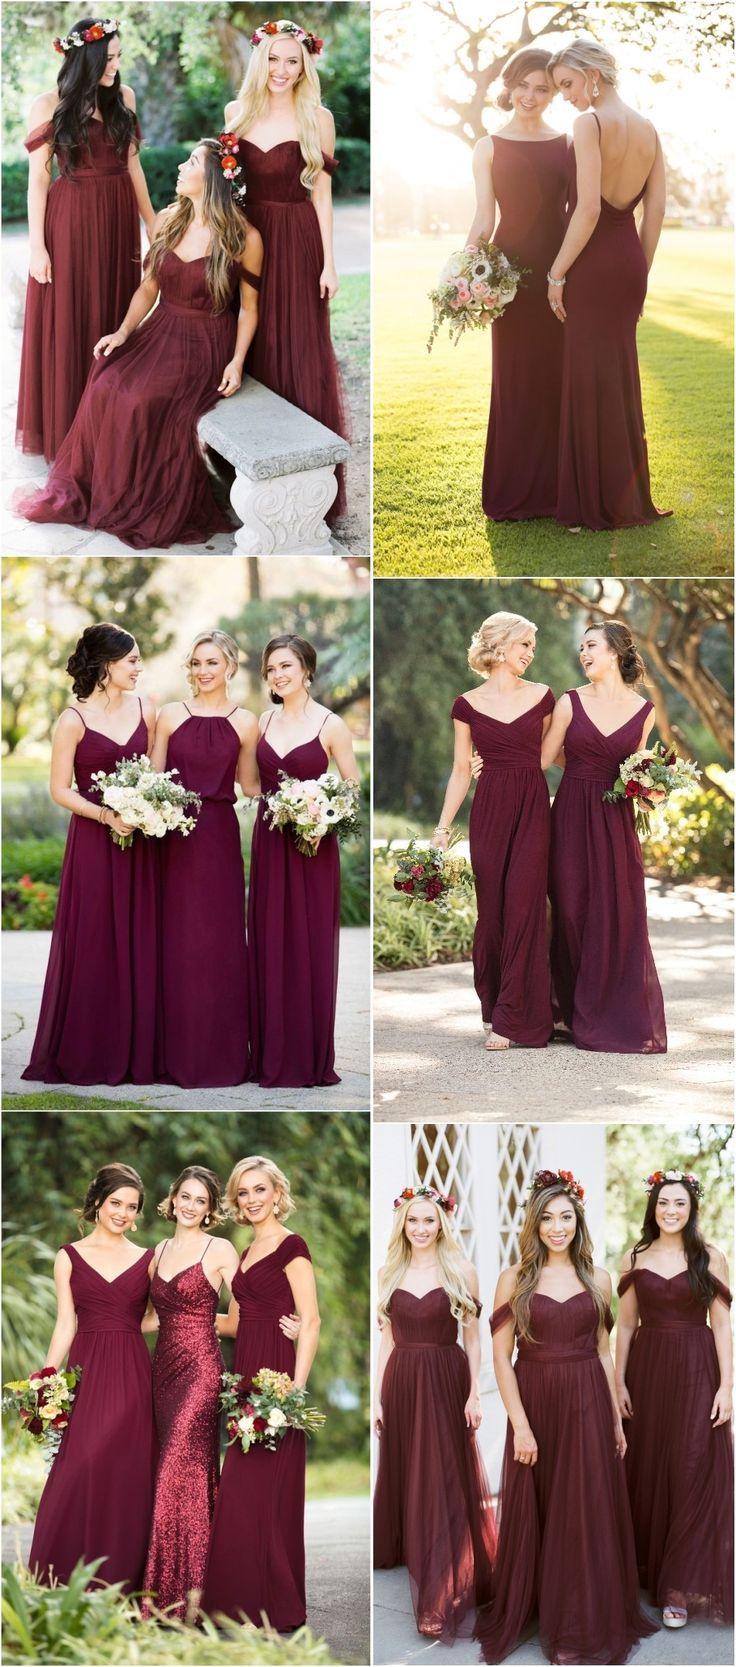 Top bridesmaid dress trends for weddingideas wedding dress